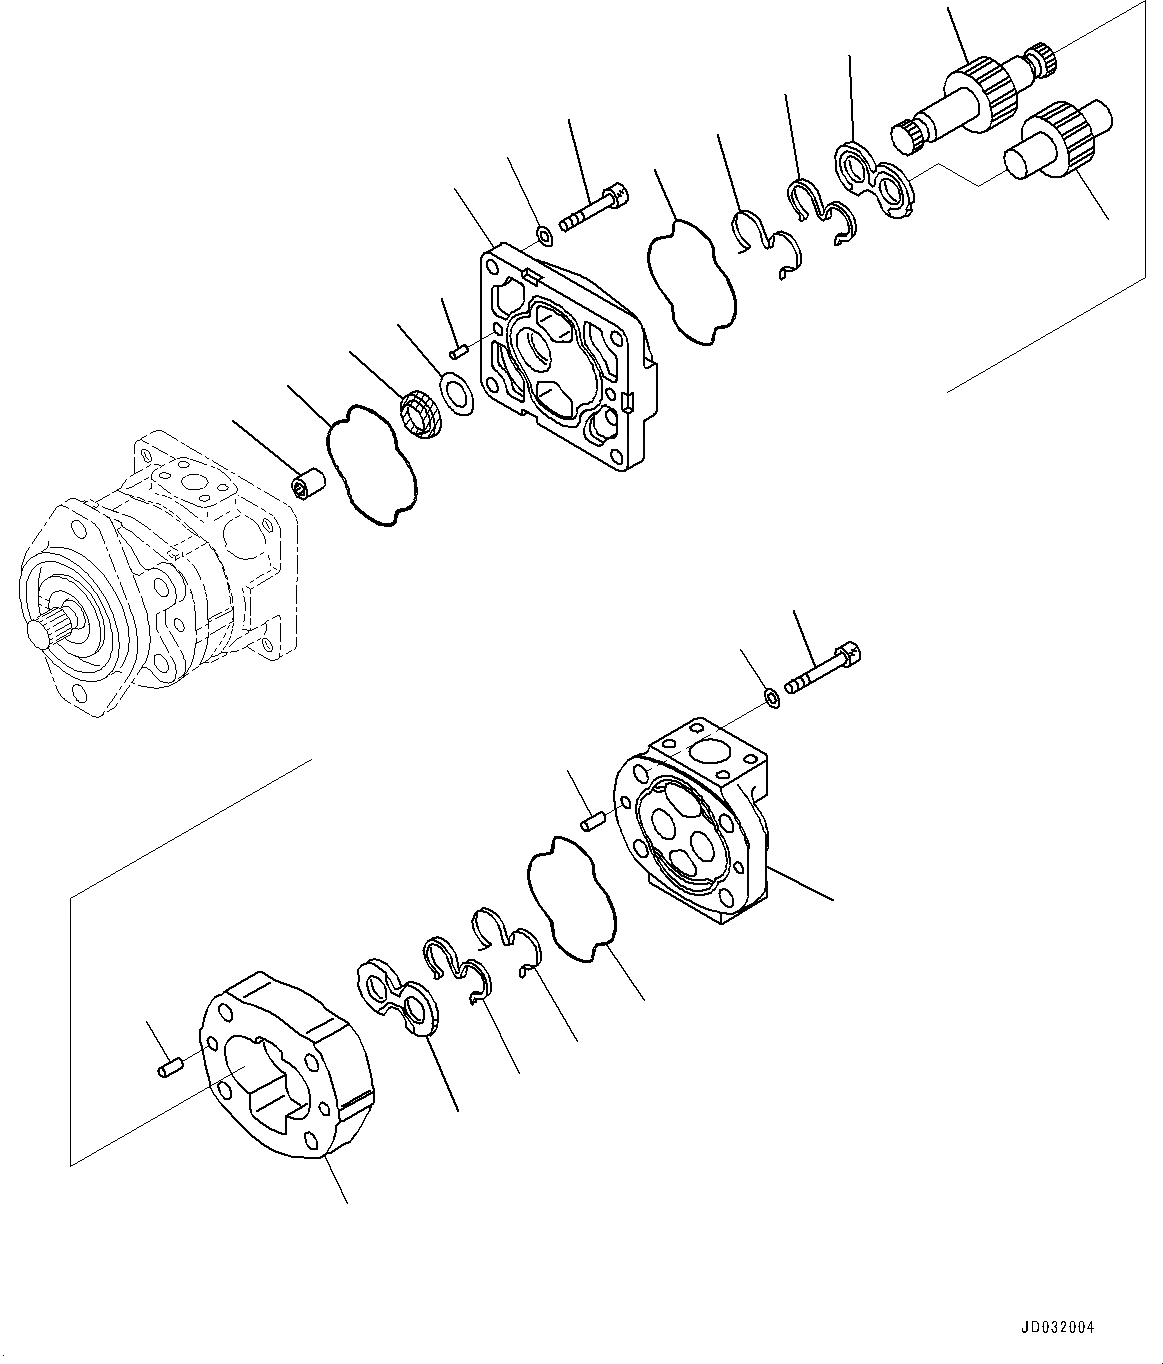 705-17-02122 Komatsu КРЫШКА В СБОРЕ